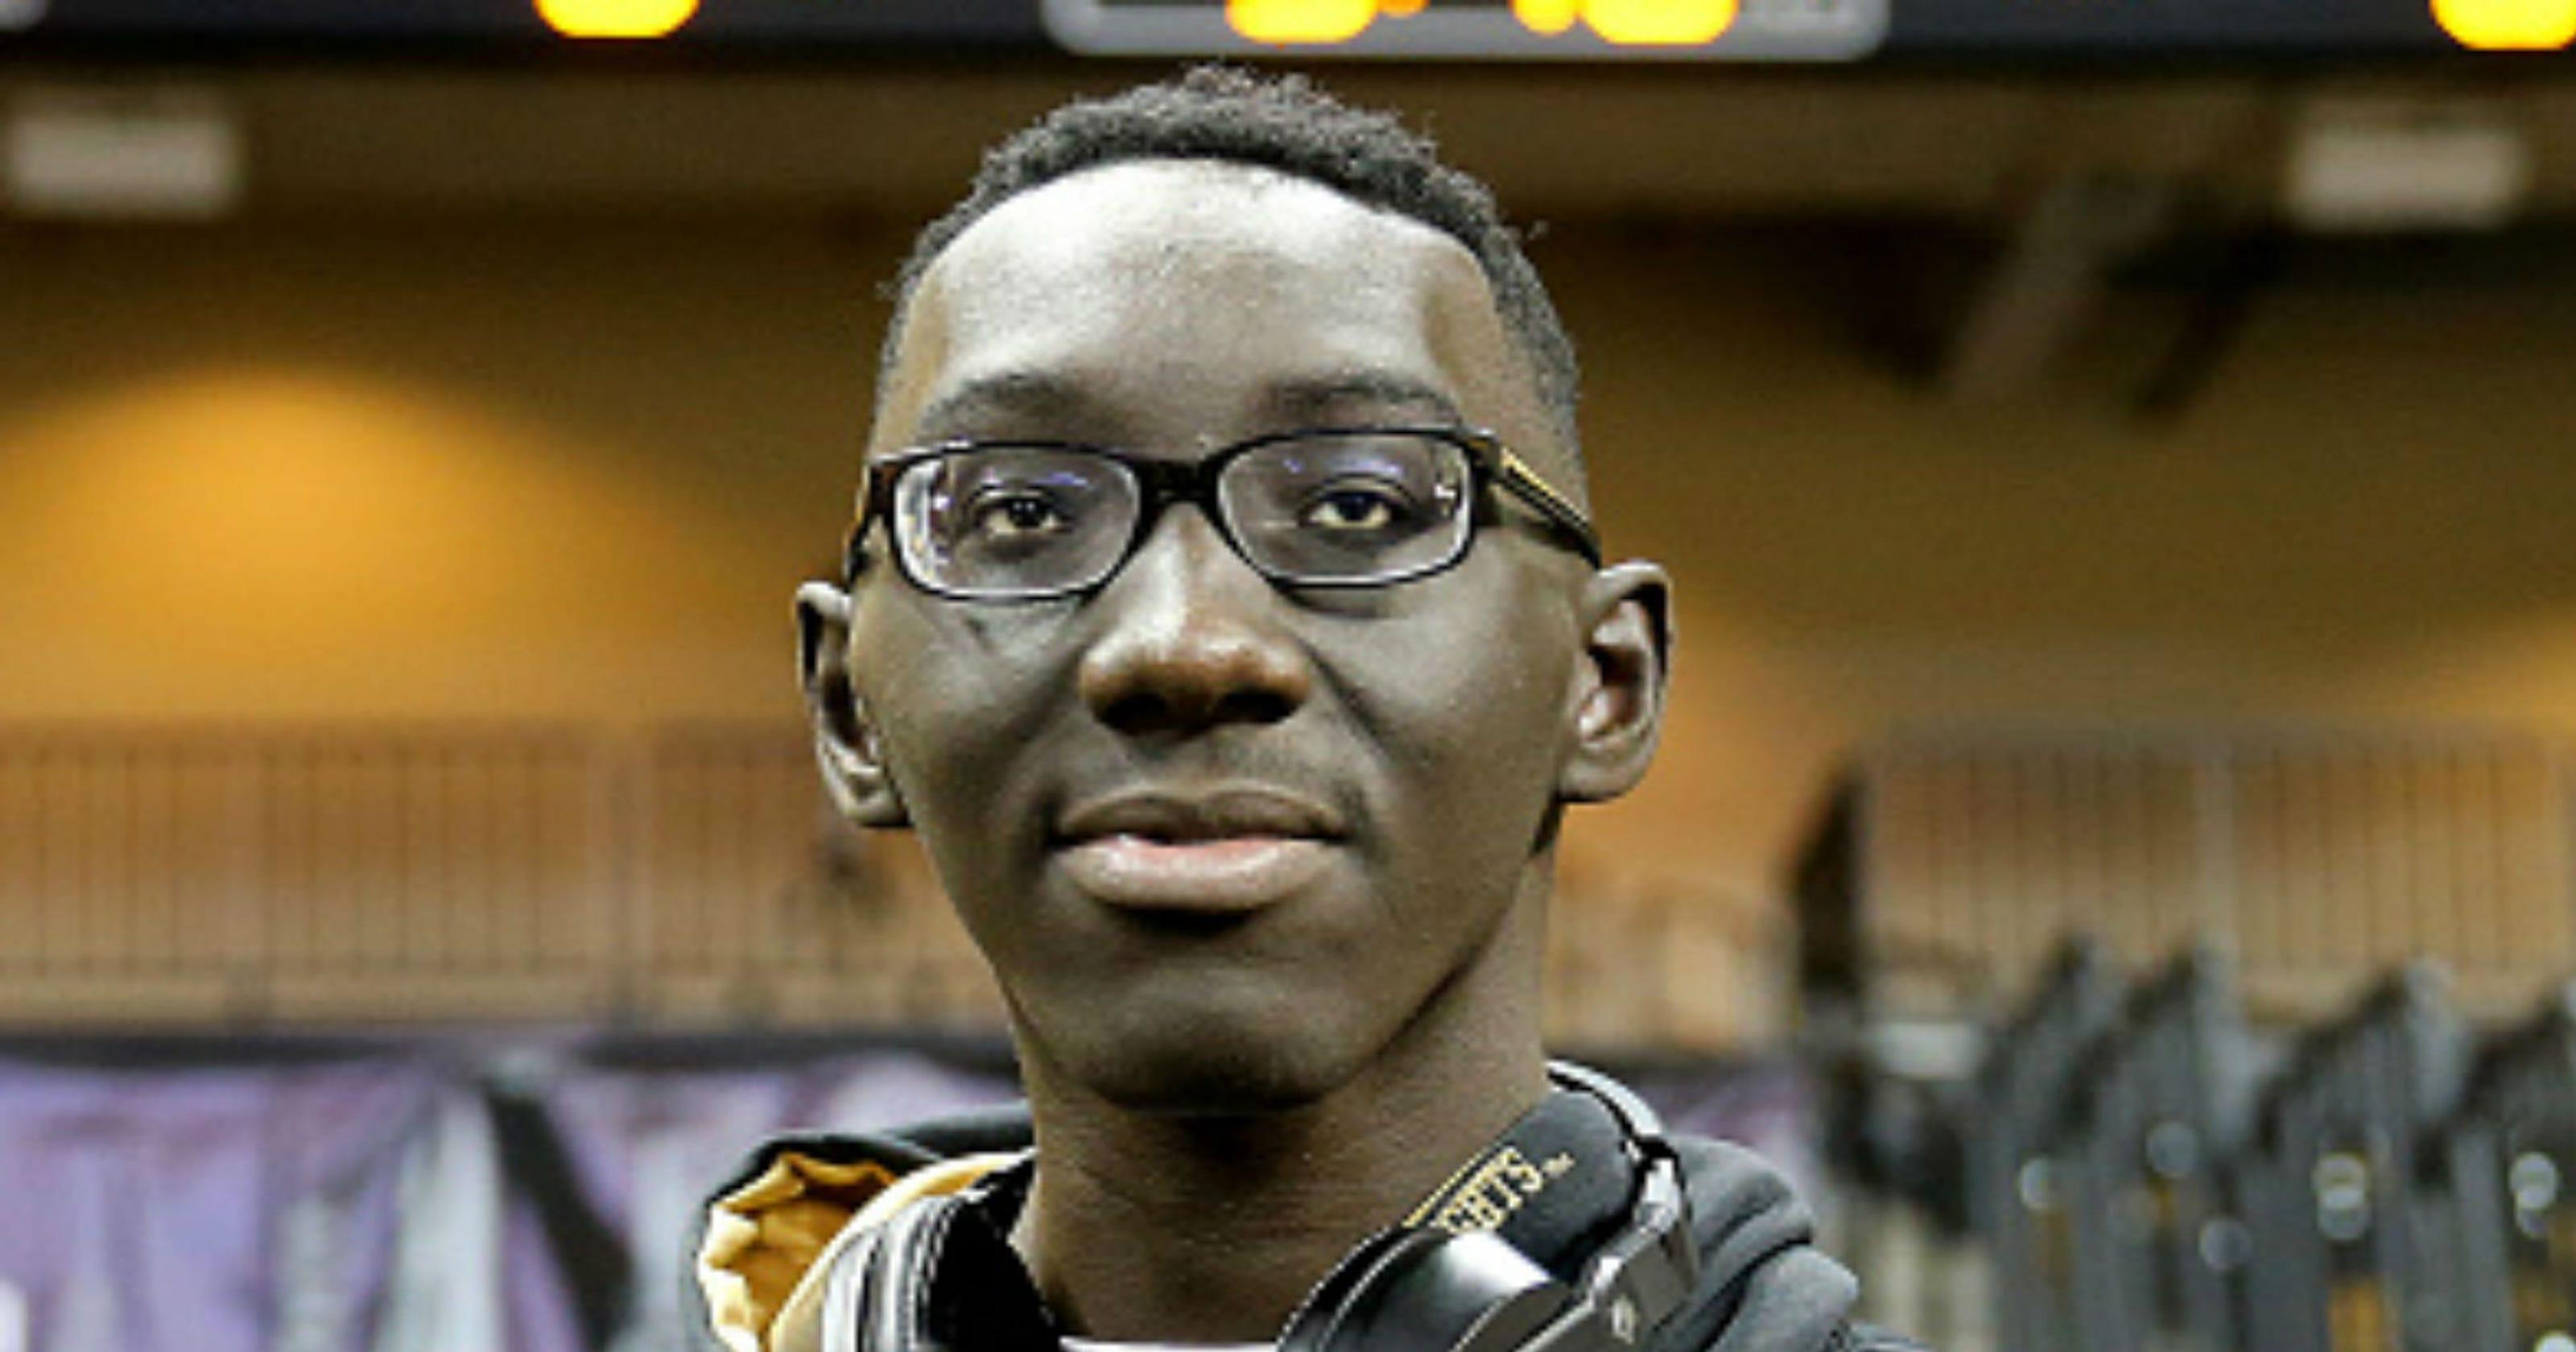 UCF 7 6 Basketball Player Tacko Fall Still Ruled